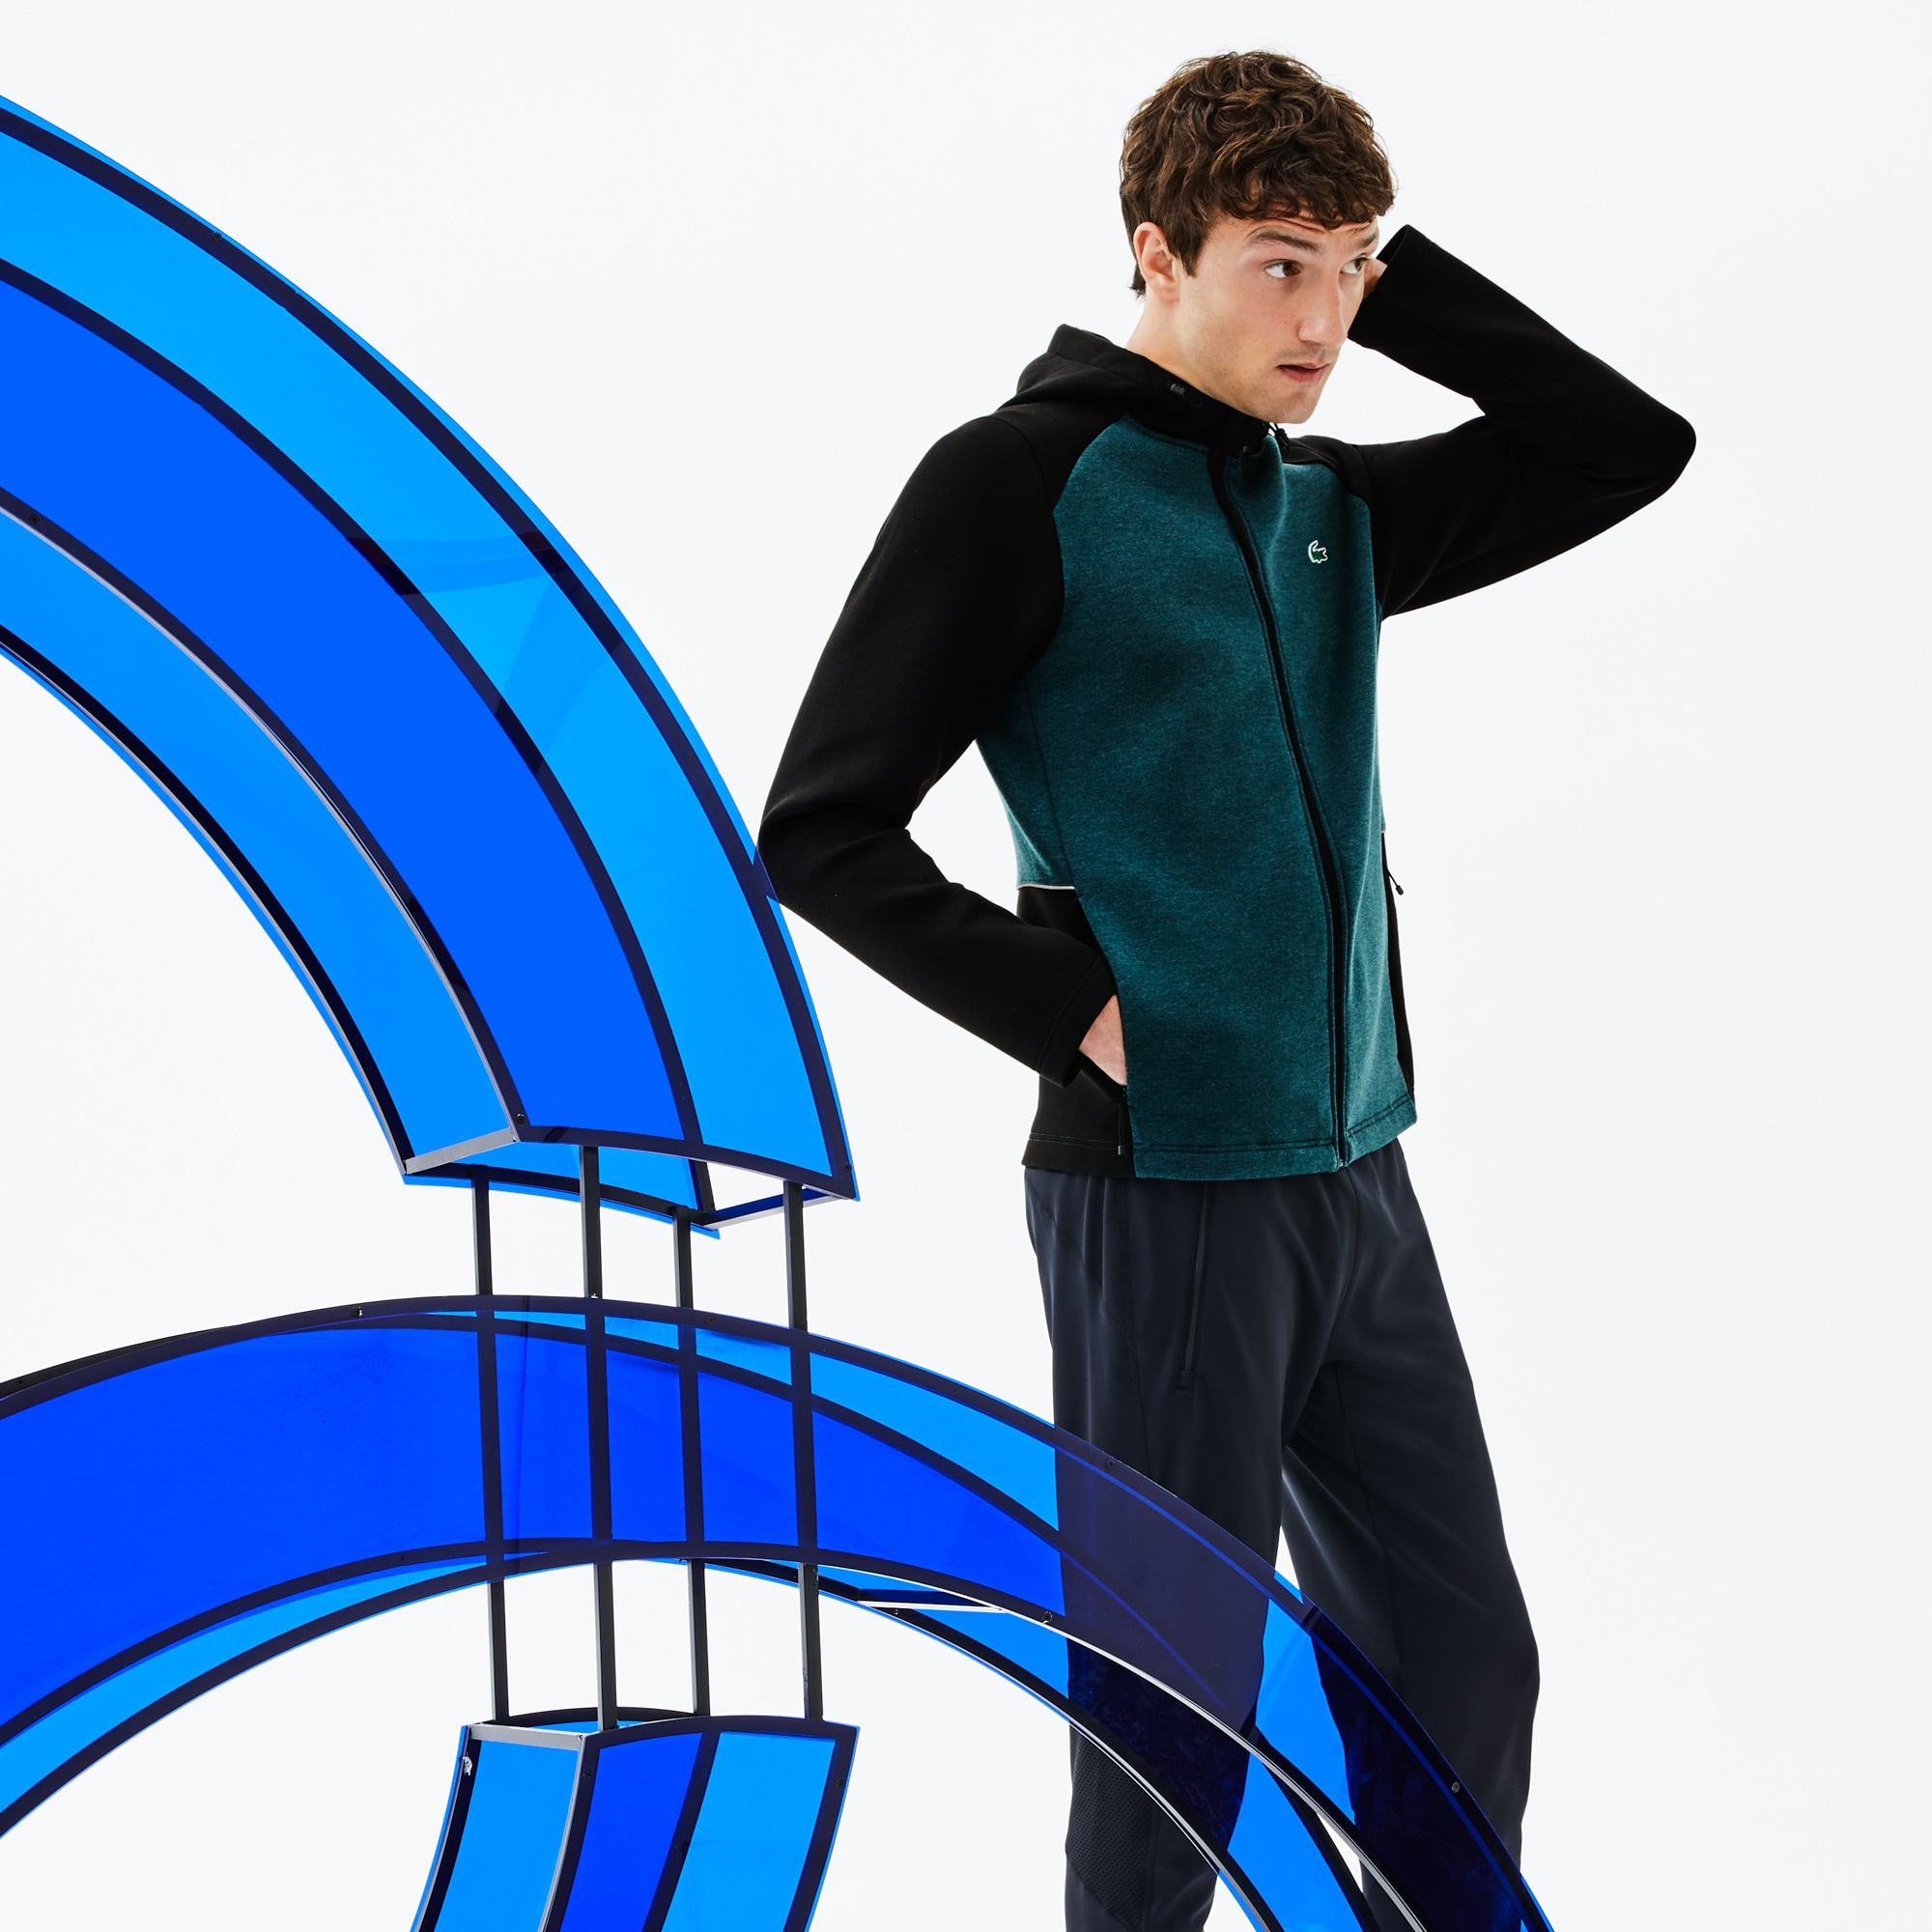 Men's SPORT Bicolour Technical Midlayer Hooded Sweatshirt - Novak Djokovic Collection